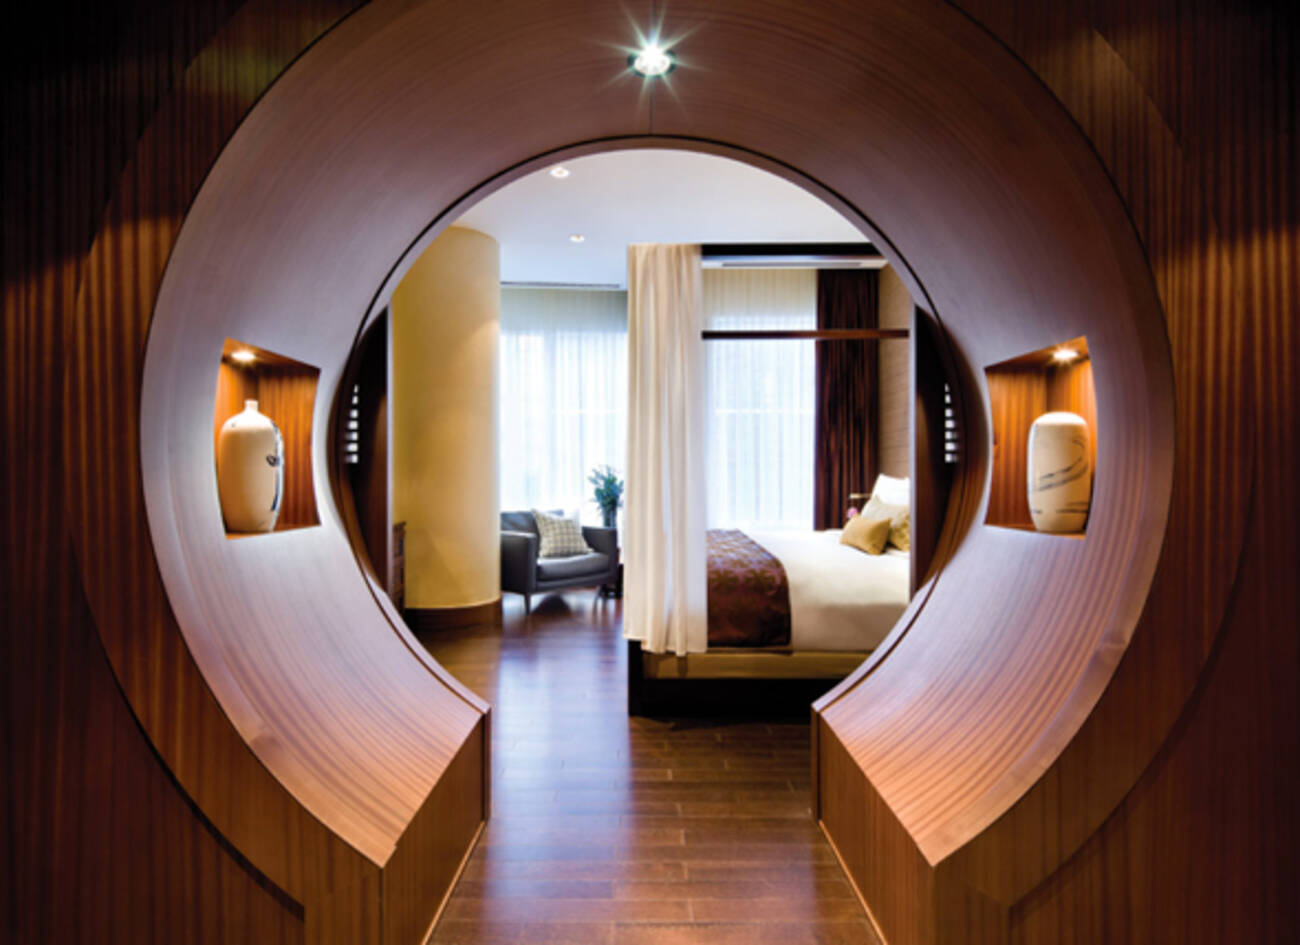 The Best Luxury Hotels In Toronto